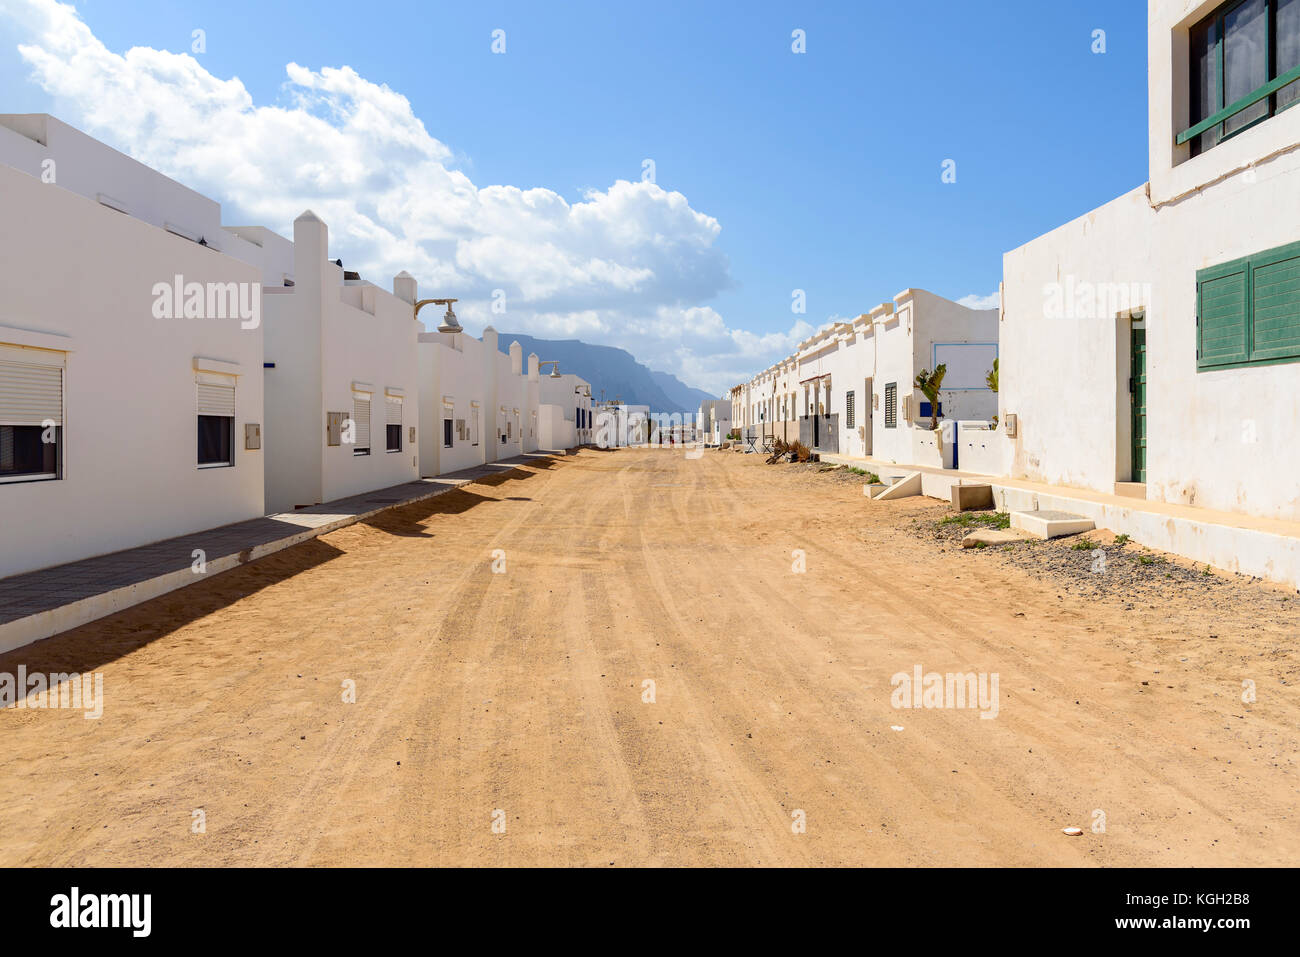 Straße von Caleta de Sebo in Insel La Graciosa, Kanarische Inseln, Spanien Stockbild